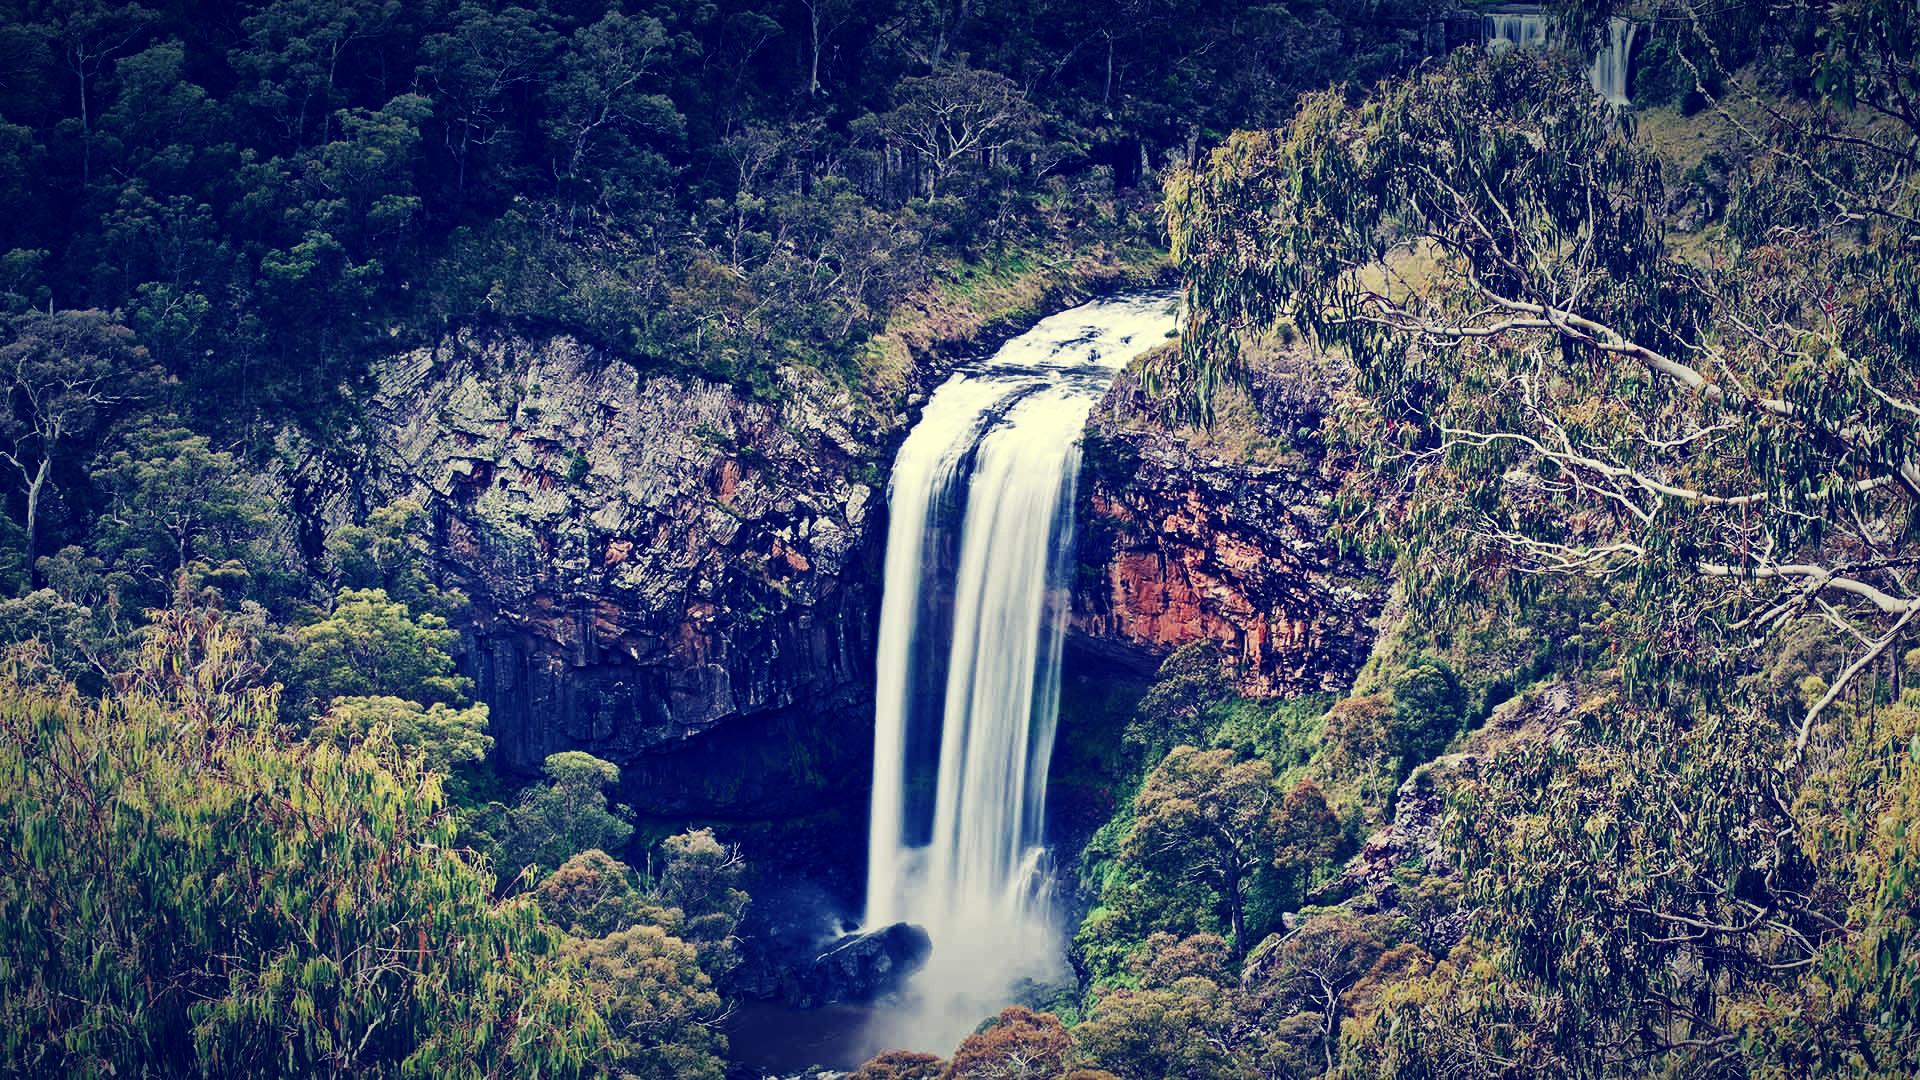 Ebor Falls, how to get to the bottom of ebor falls, ebor falls to coffs harbour, ebor falls frozen, ebor falls weather, ebor falls dogs, tamworth to ebor falls, ebor nsw wollomombi falls